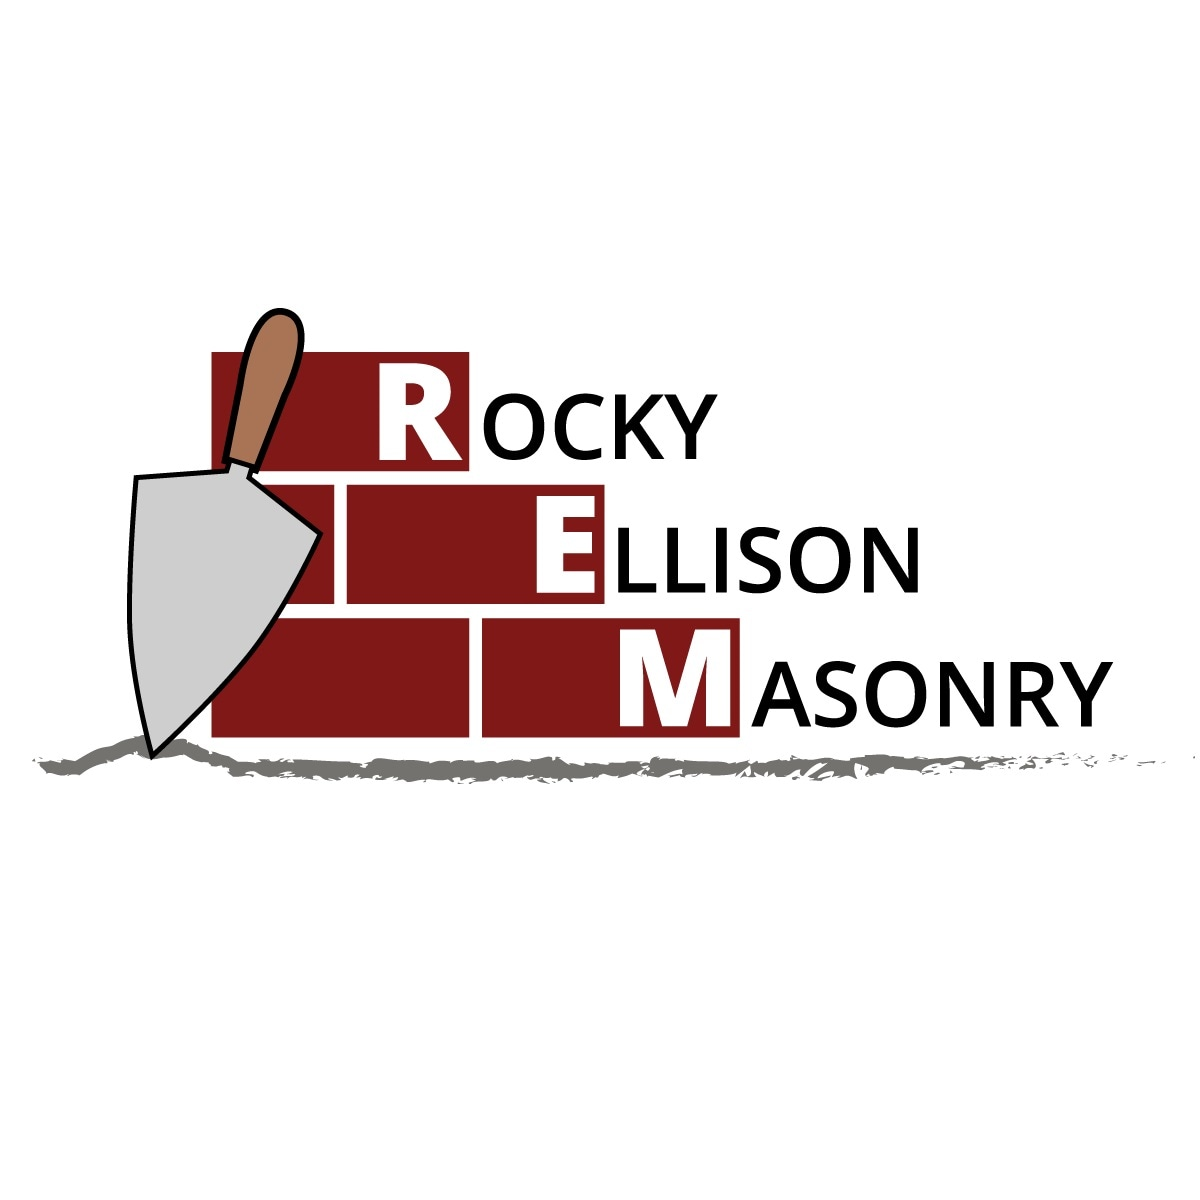 ROCKY ELLISON MASONRY